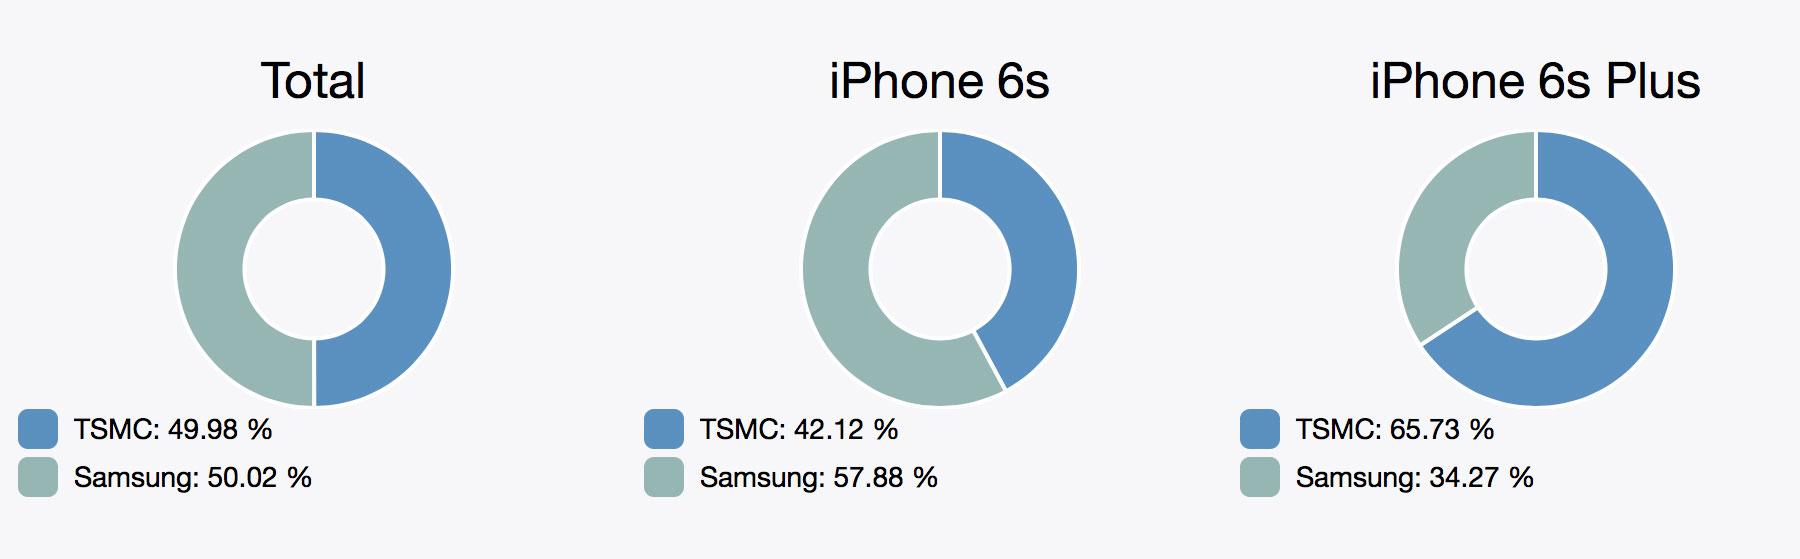 iphone 6s plus samsung tsmc imazing battery life chipgate